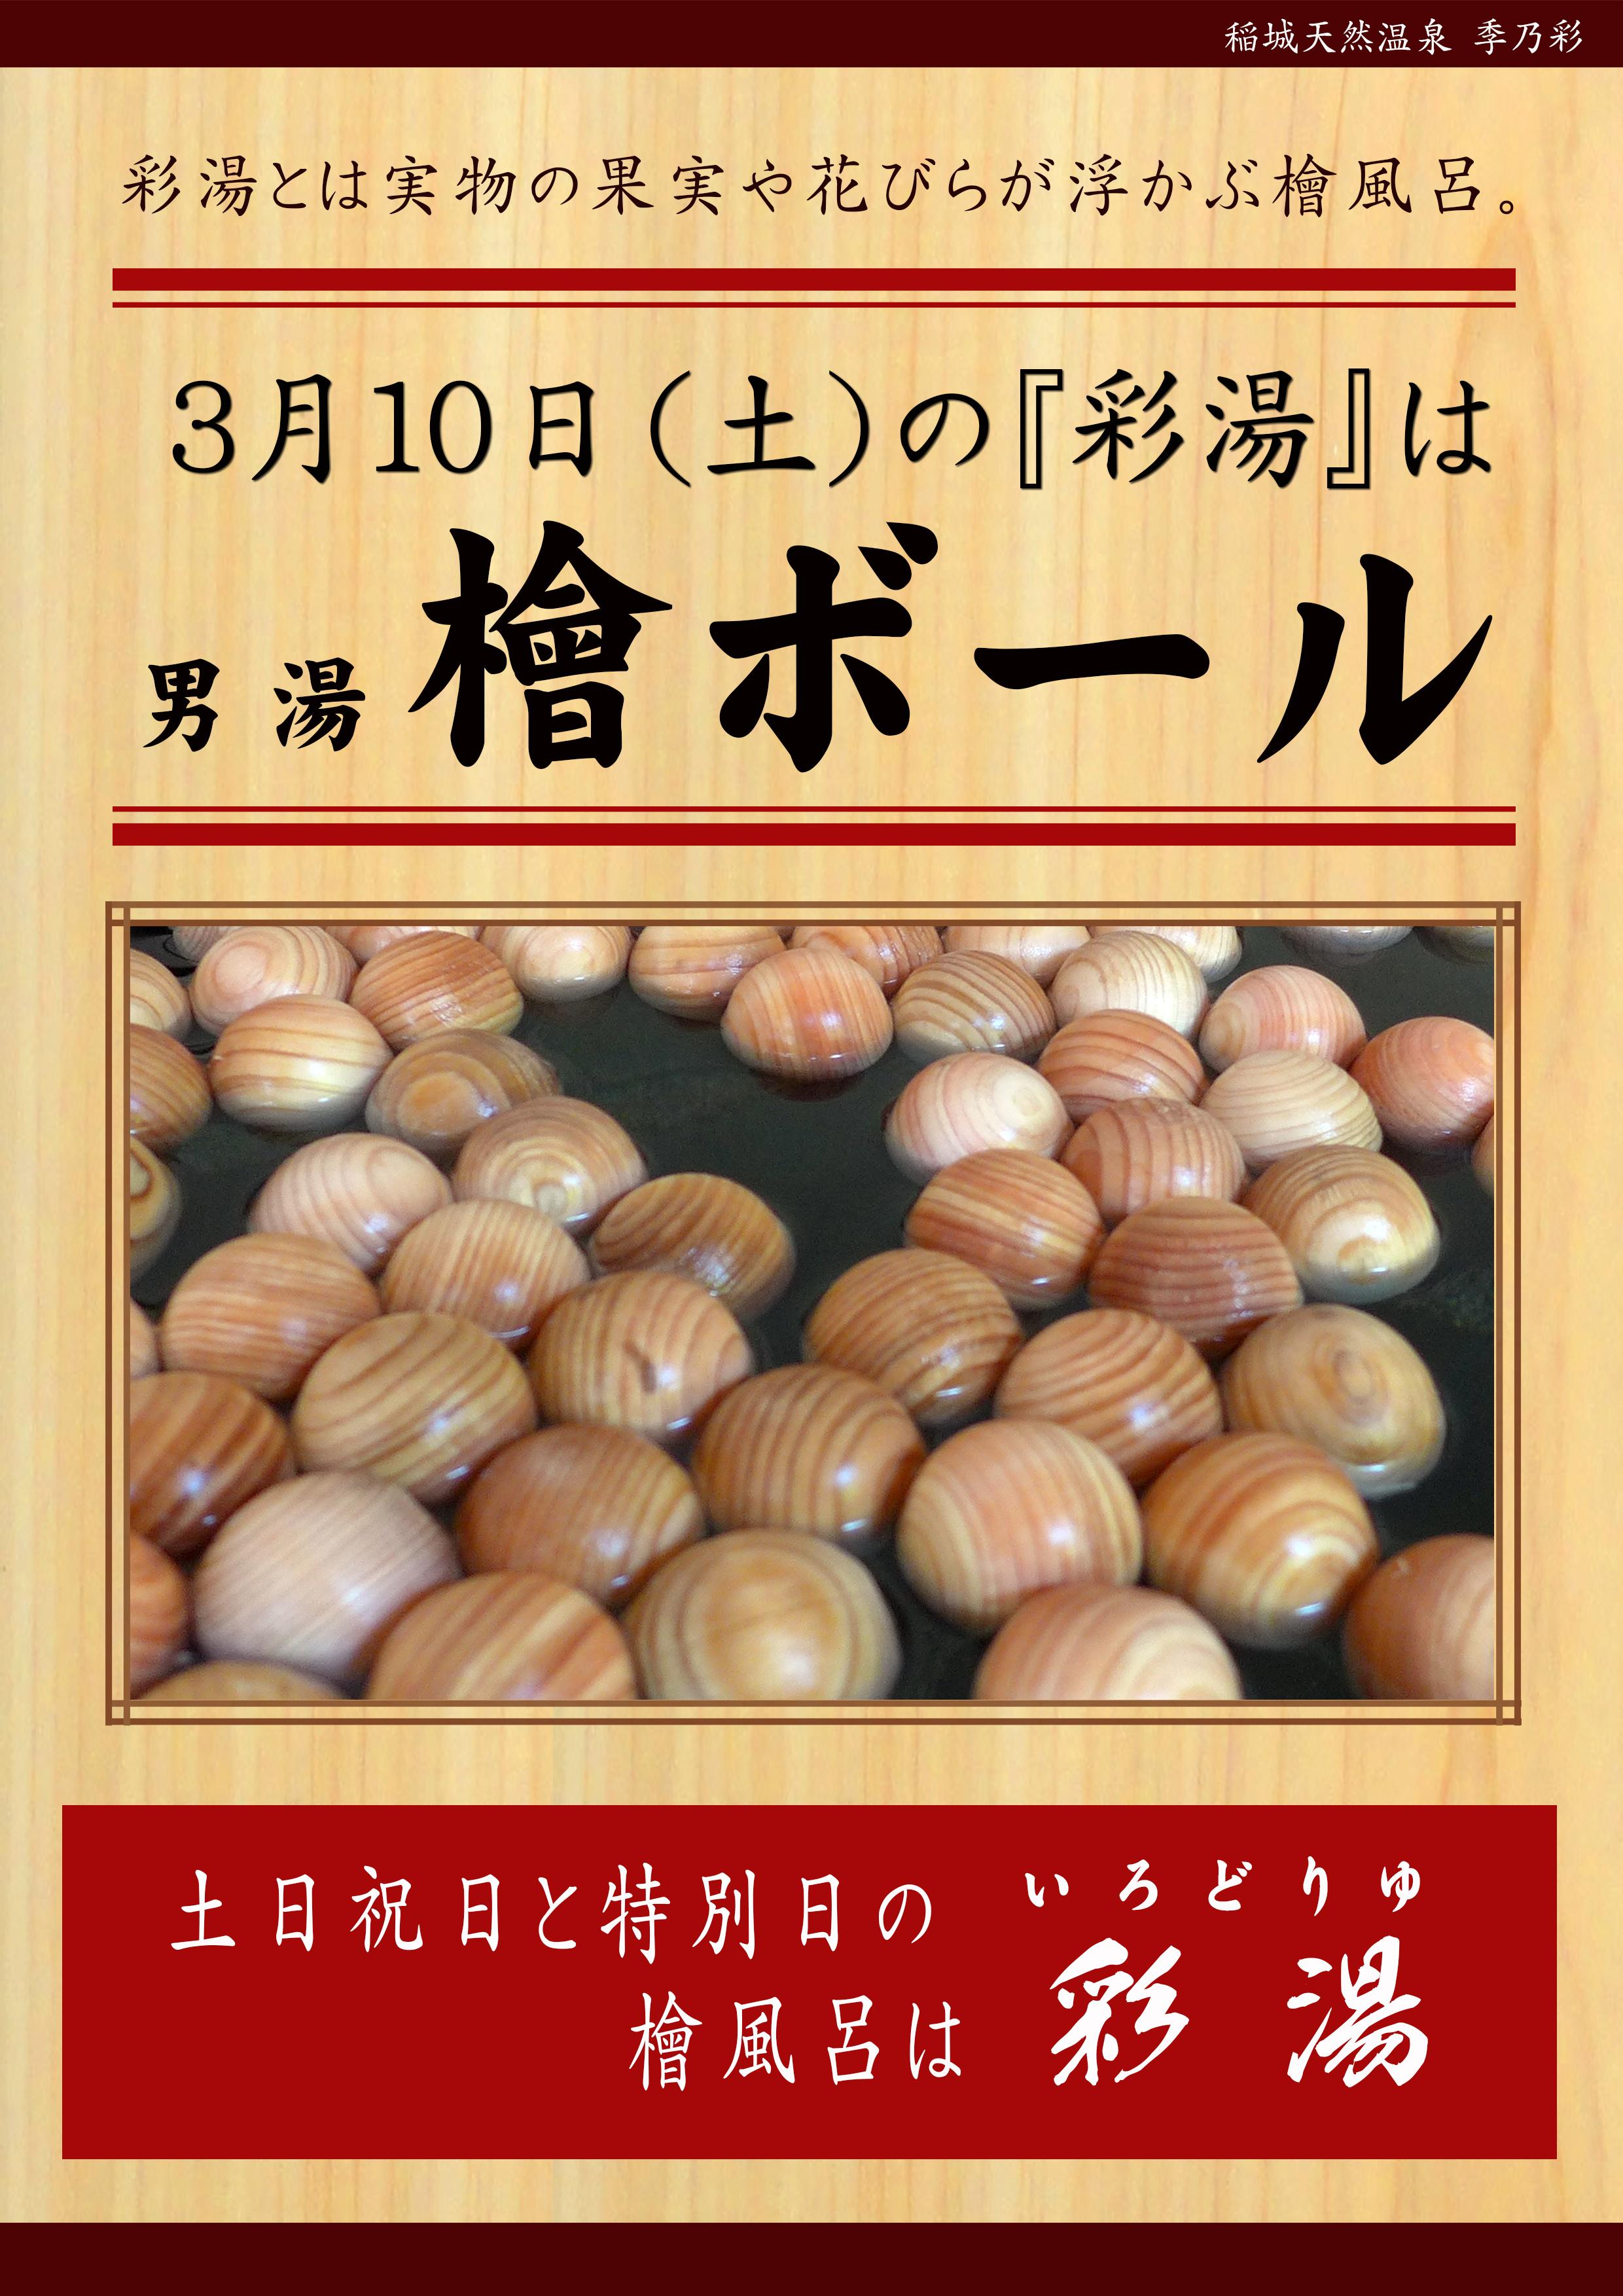 20180310POP イベント 彩湯 男湯 檜ボール